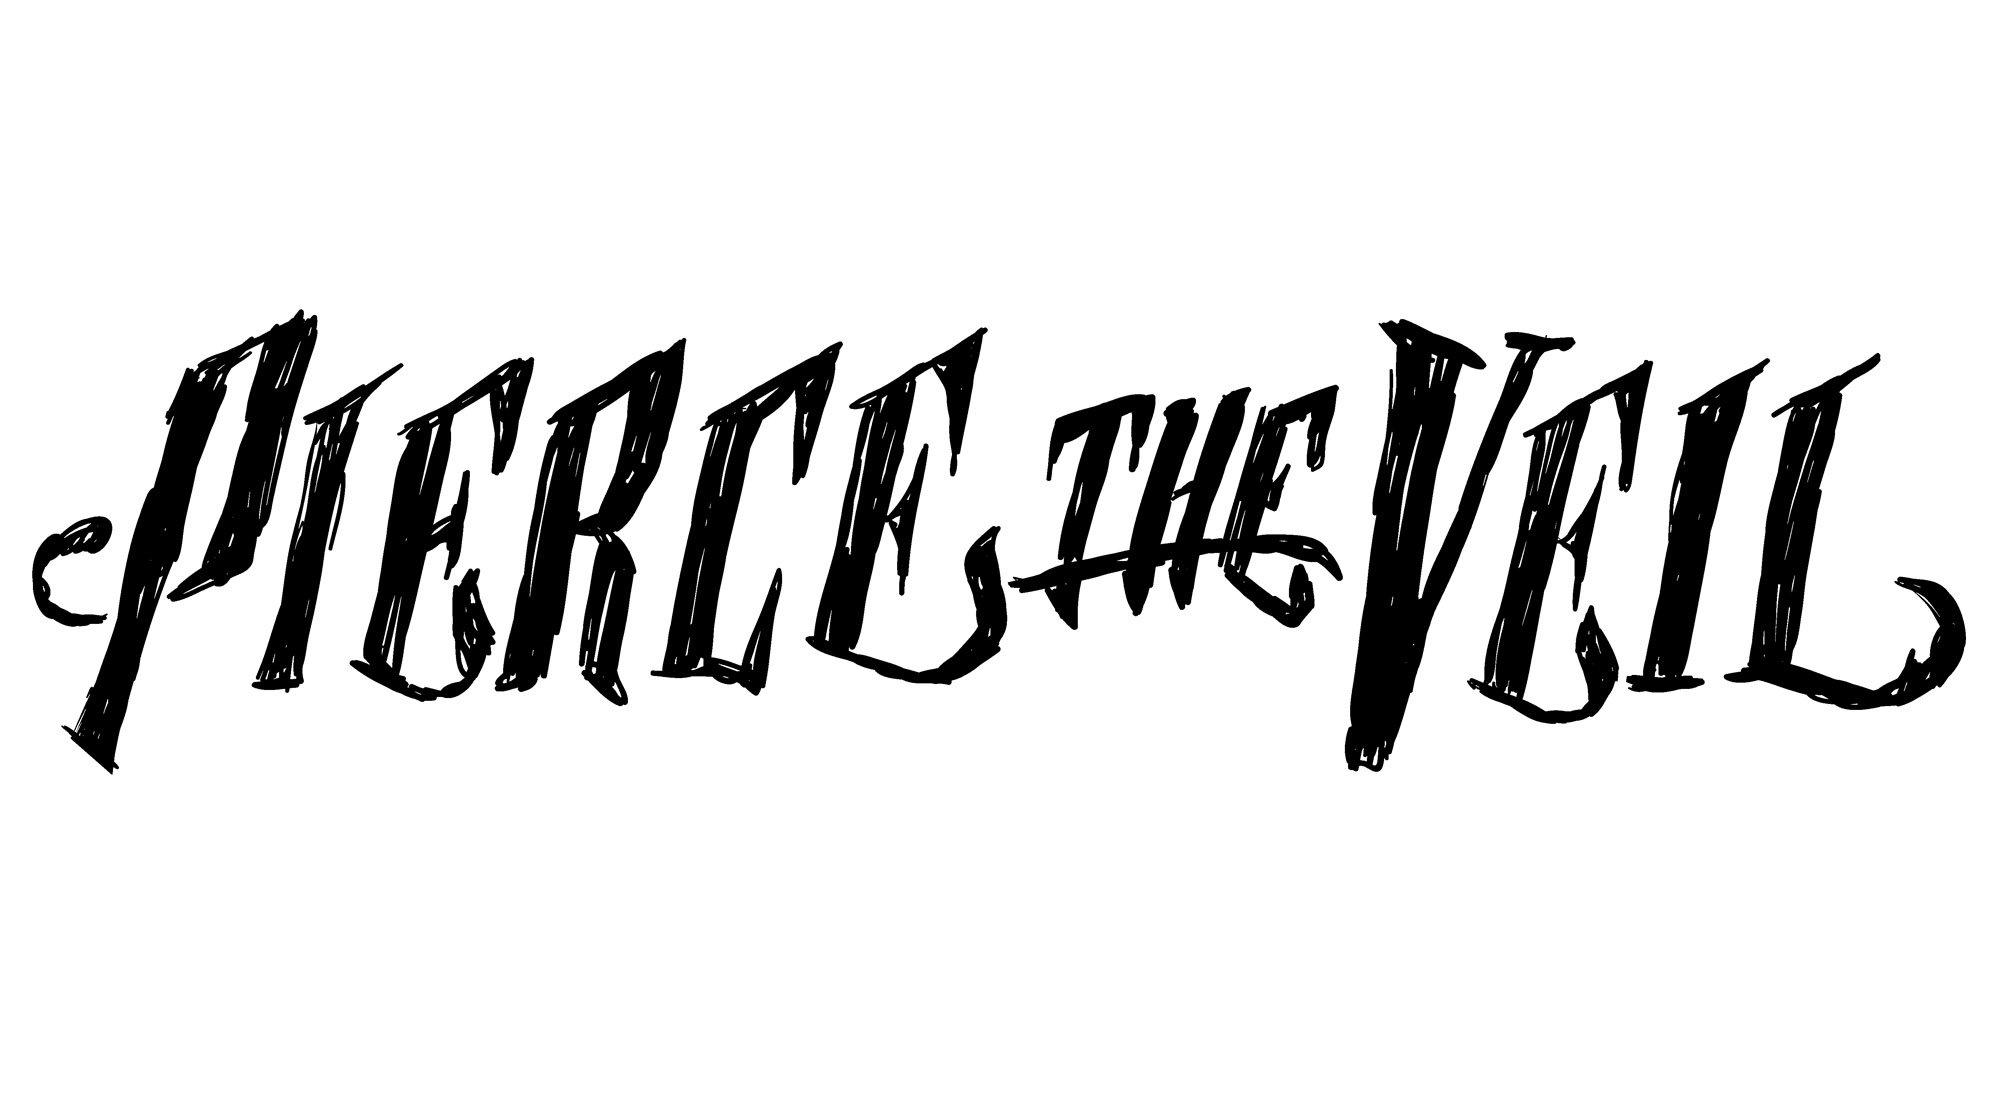 Pierce the Veil Logo, Pierce the Veil Symbol, Meaning